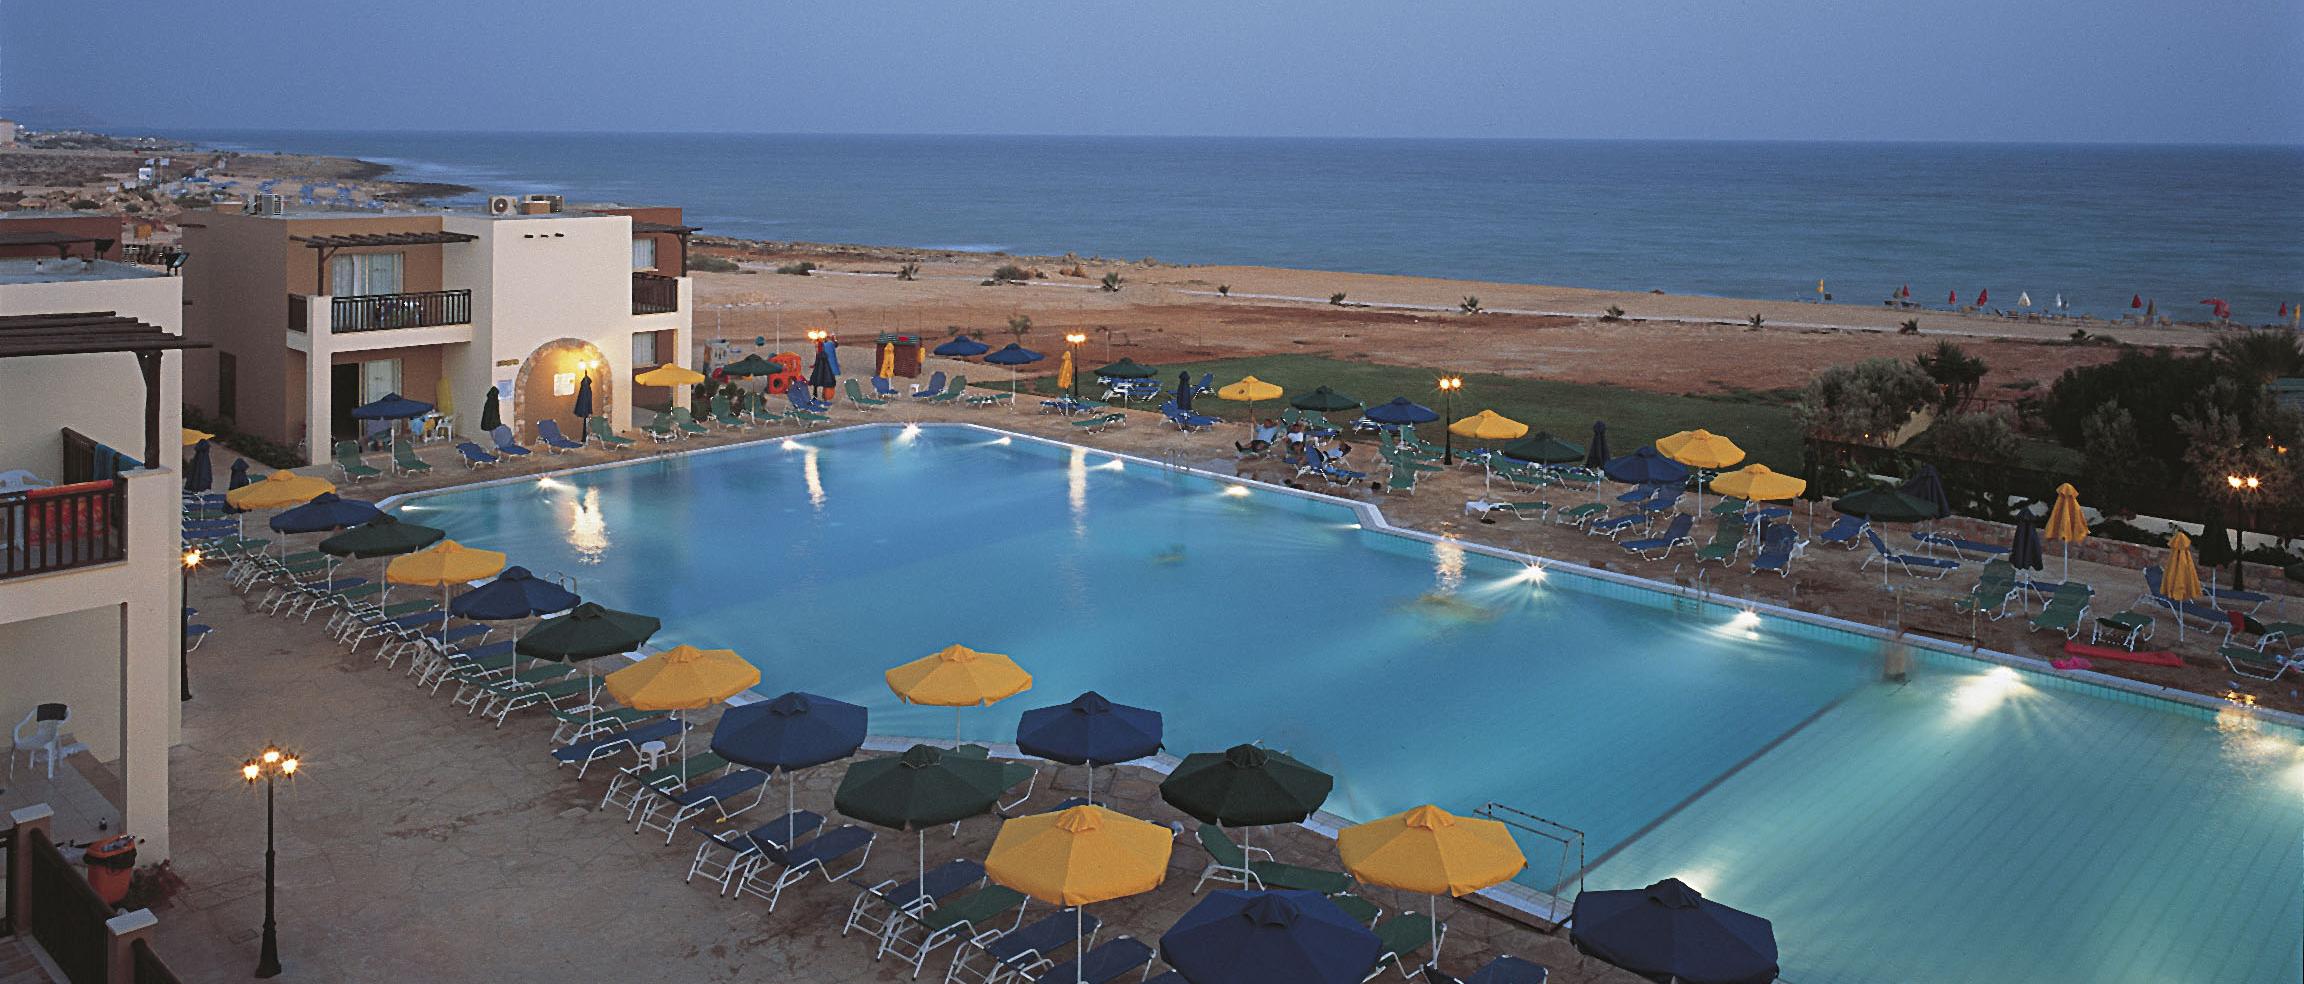 Pool in Ayia Napa Hotels